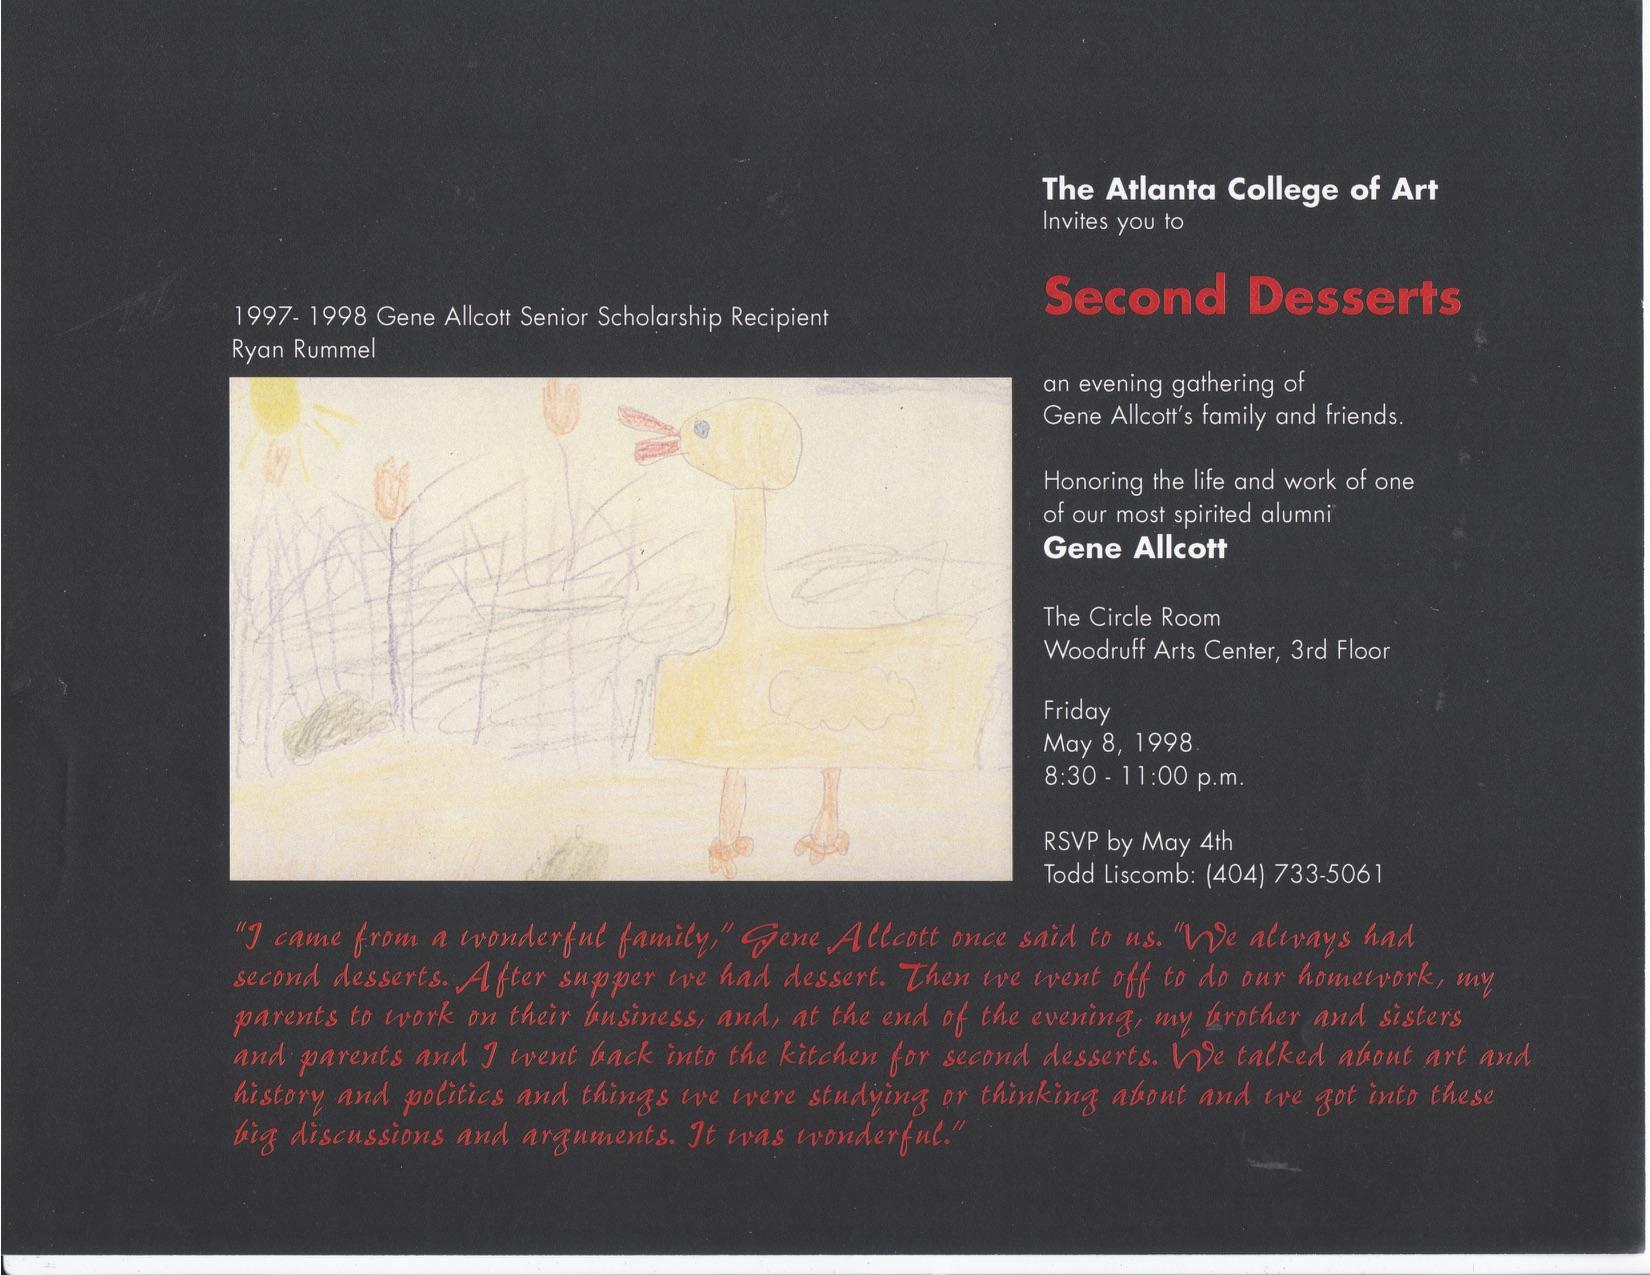 1998 Atlanta College of Art Second Desserts Event. Illustration by Allcott Scholar Ryan Rummel.